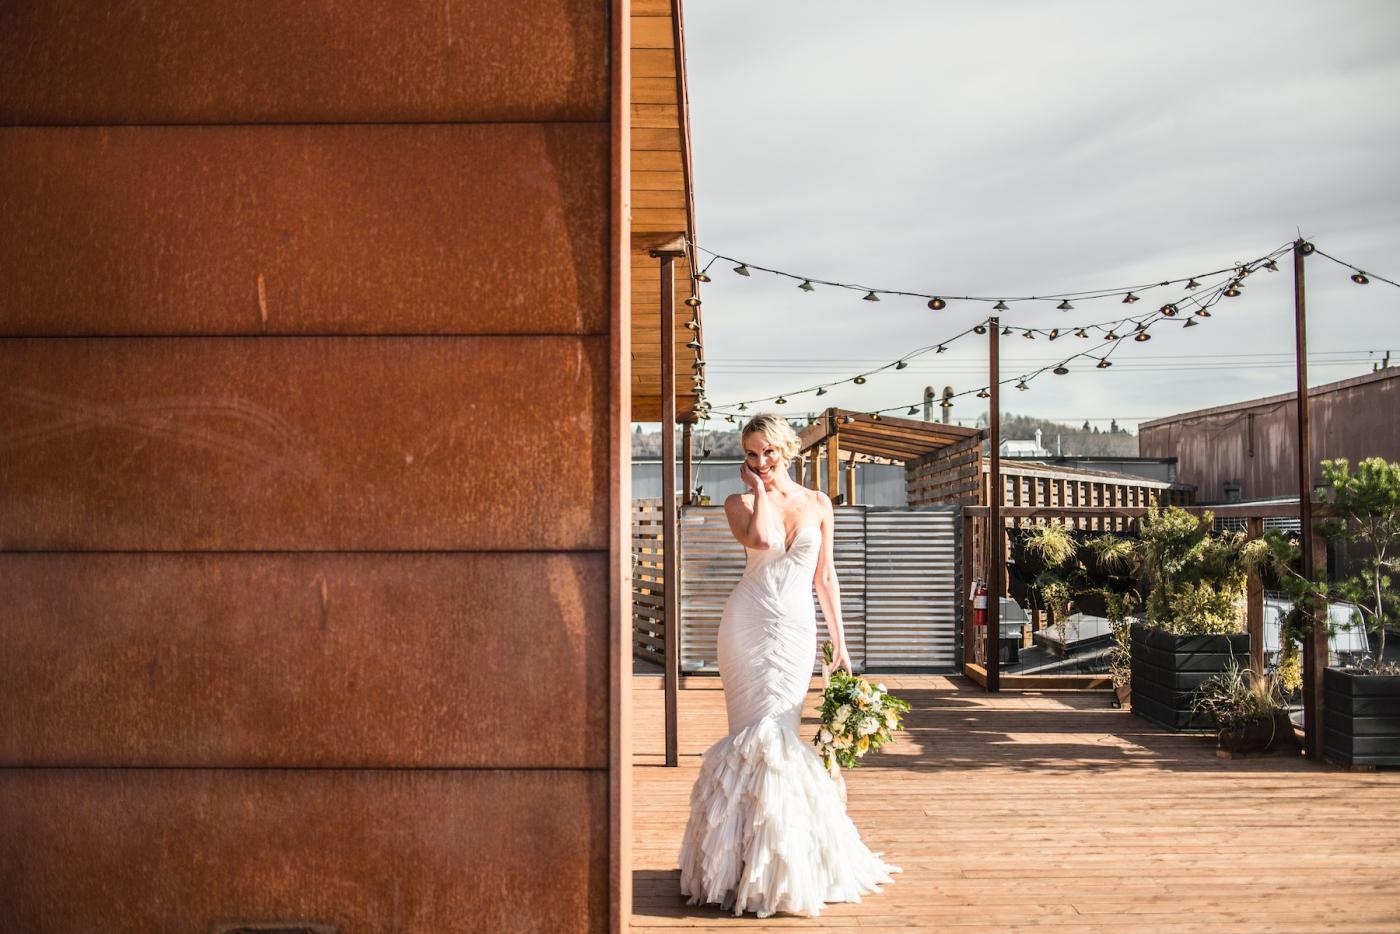 photography_by_jane_speleers_2017_wedding_show_i_do_sodo_within_designed_by_melody_davisdsc_0474